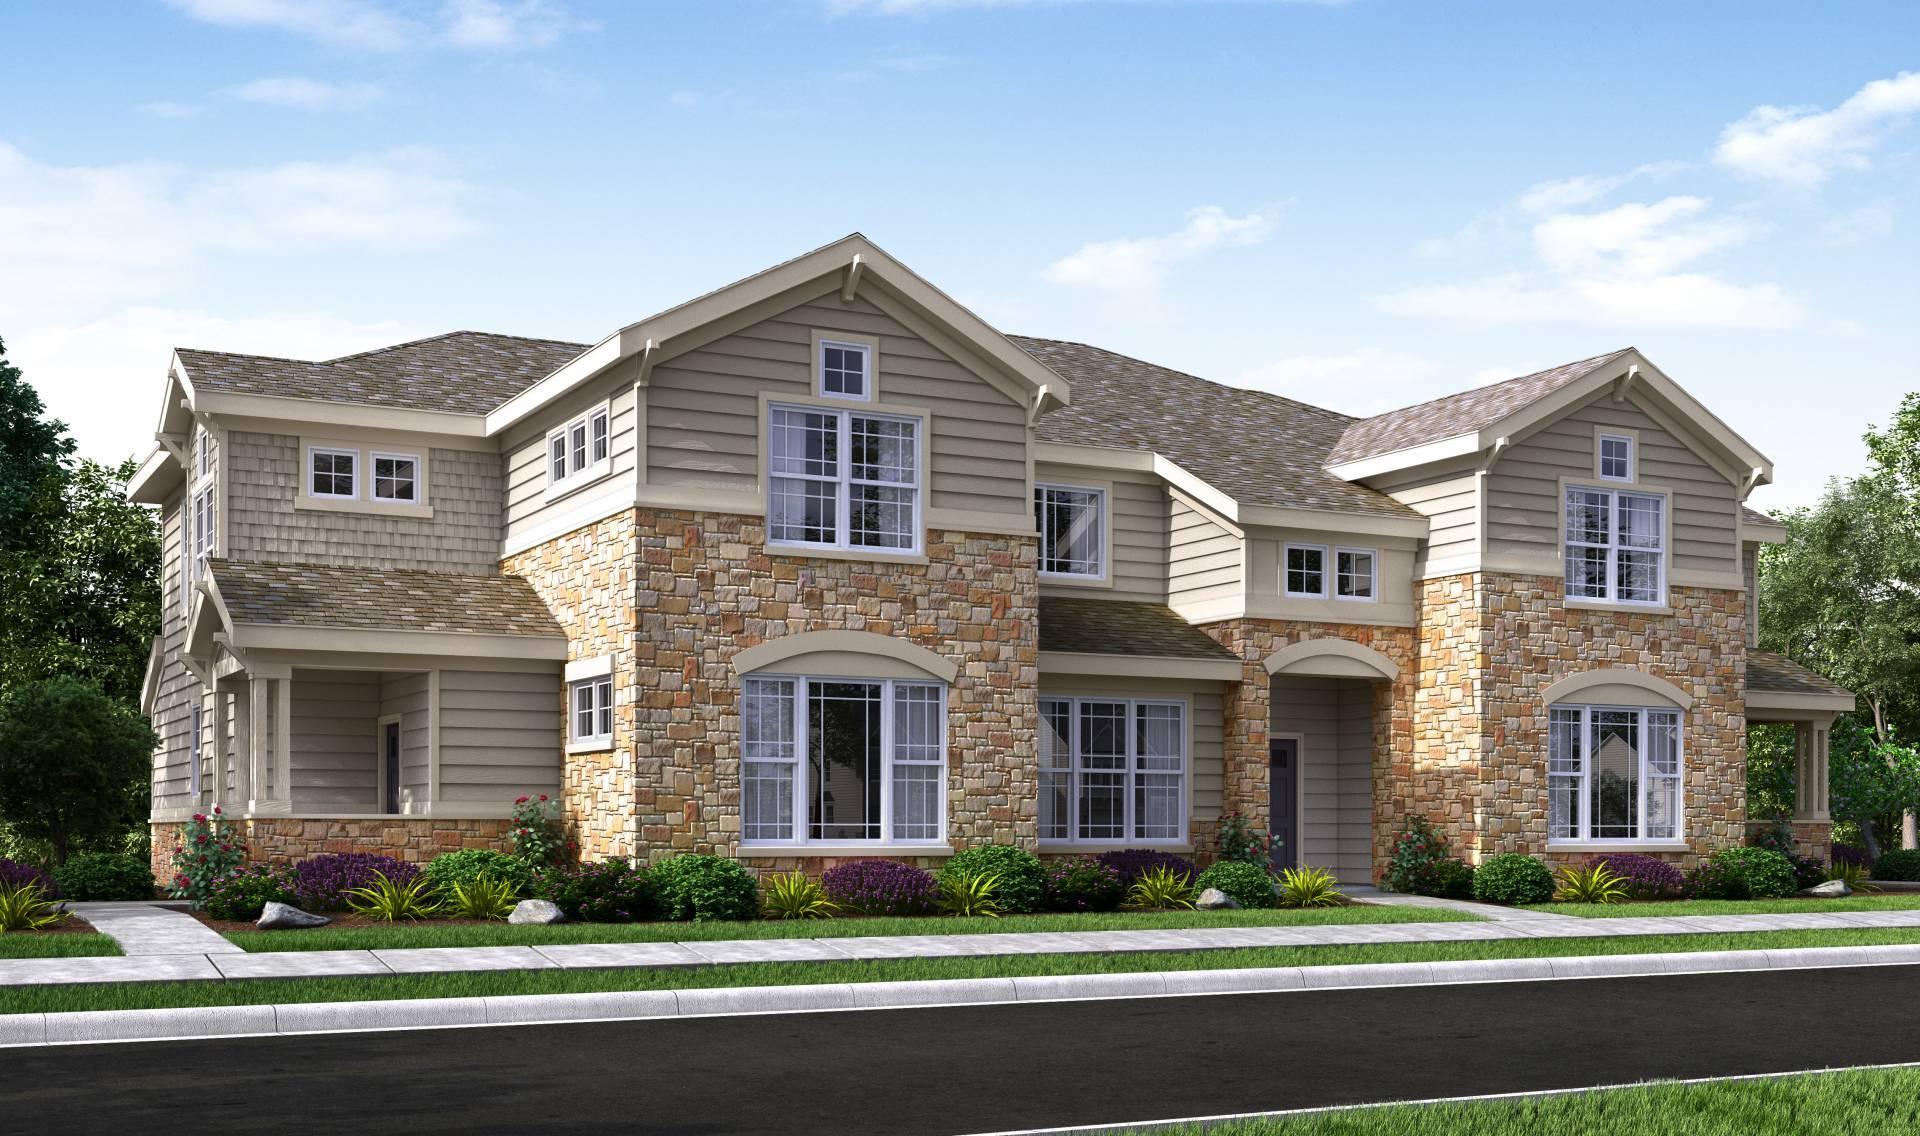 Colorado Houses For Sale And Colorado Homes For Sale